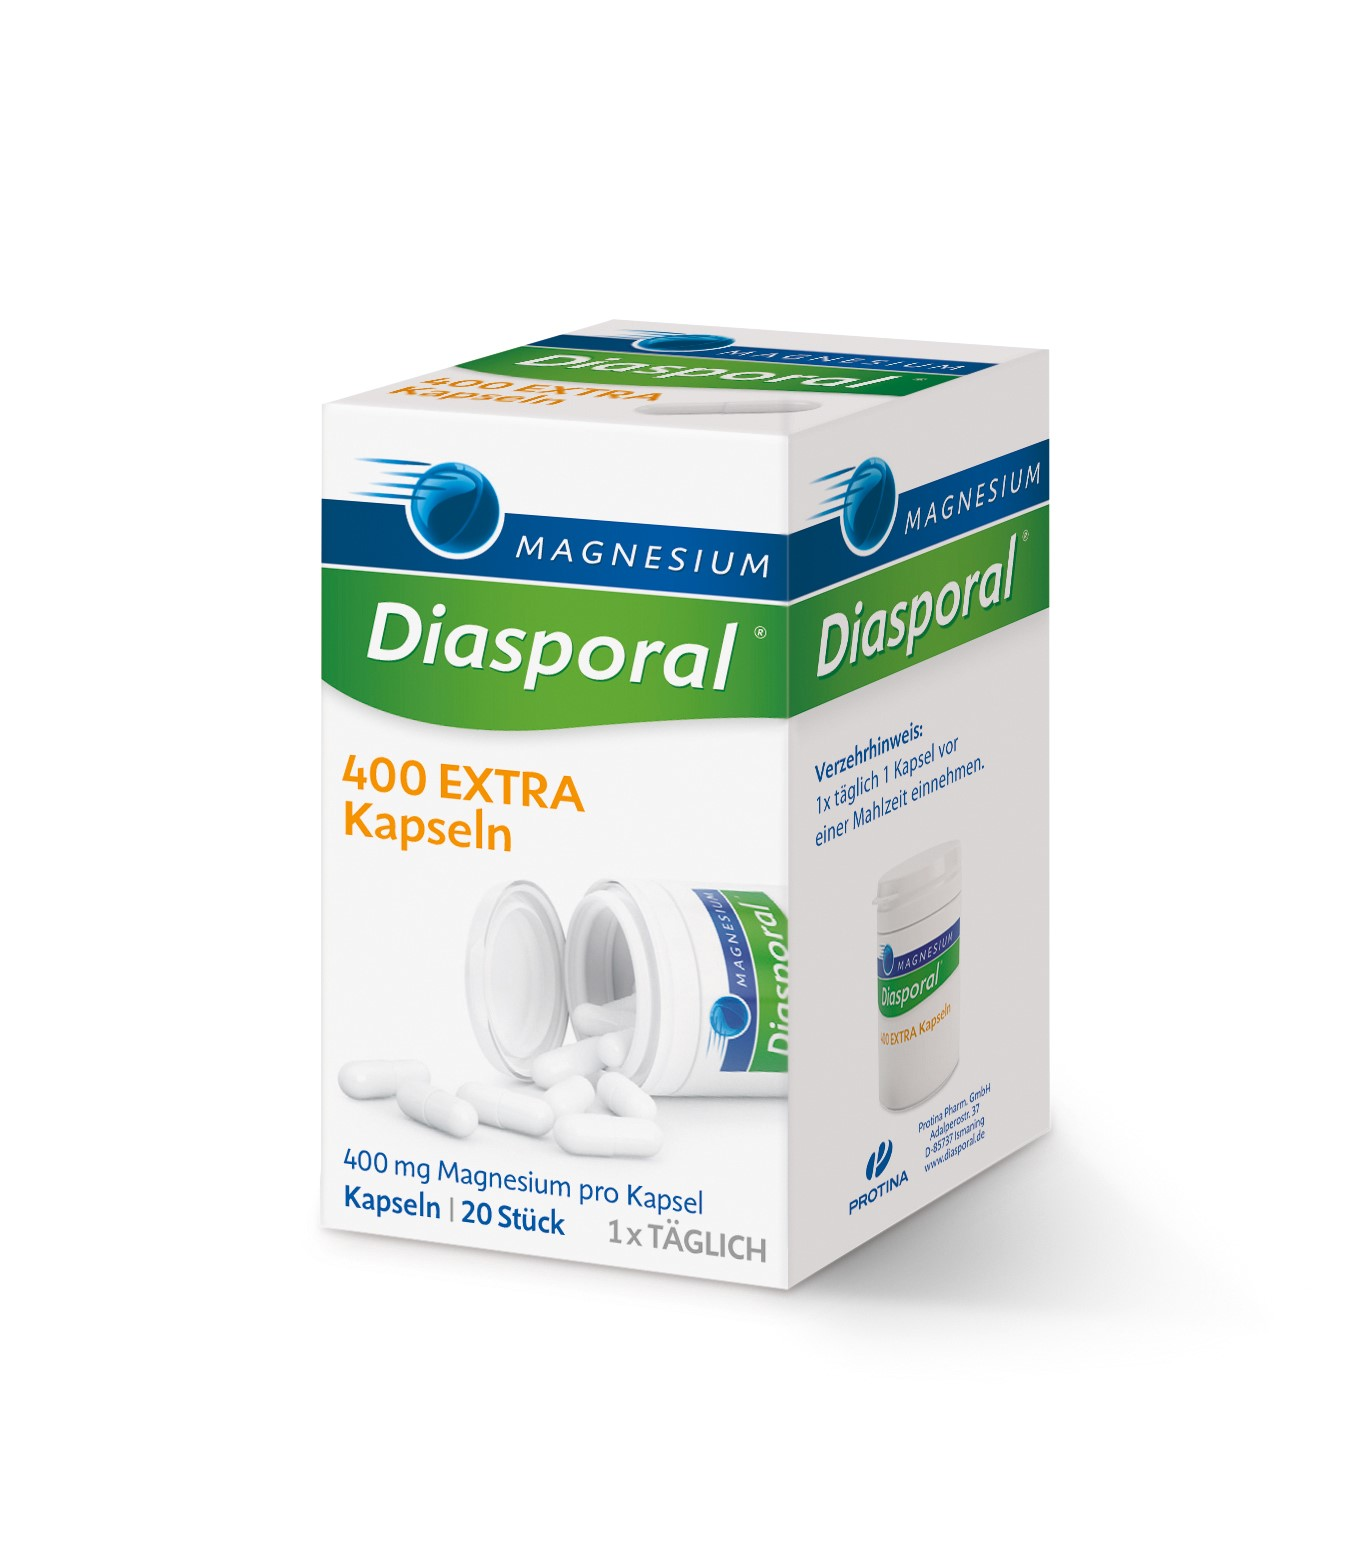 Magnesium Diasporal 400; EXTRA Kapseln